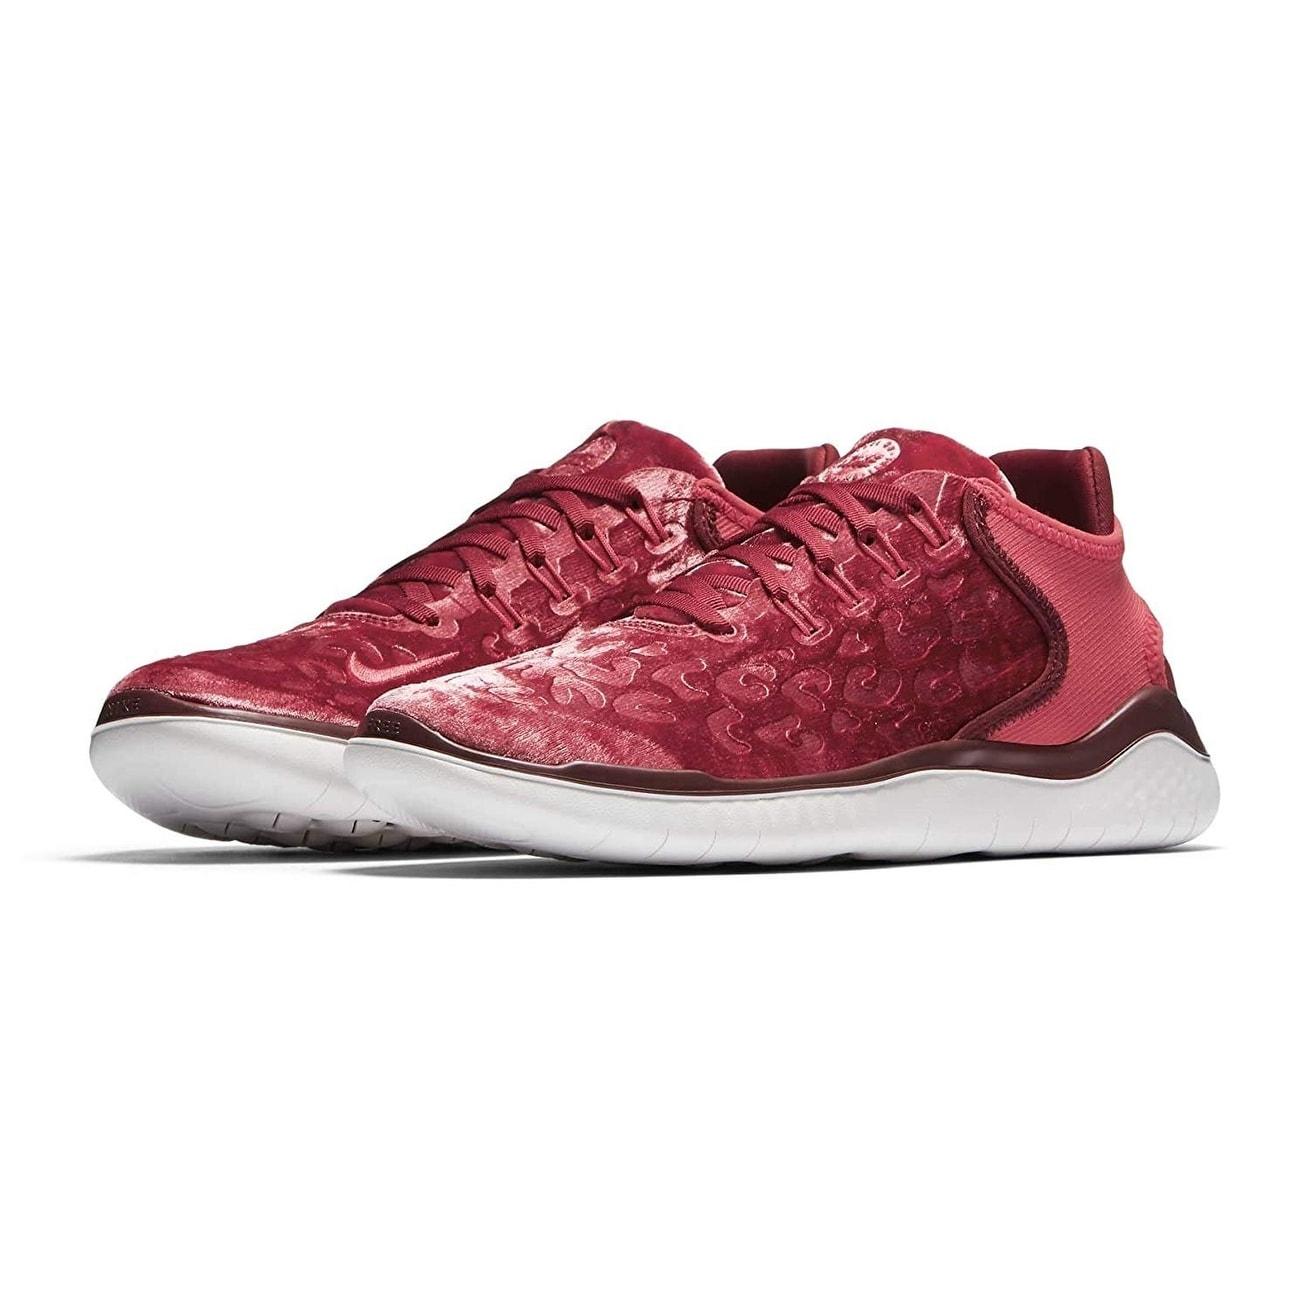 muy agradable Restaurar Extracto  Nike Women's Free RN 2018 Wild Velvet Running Shoe - Overstock - 28979716